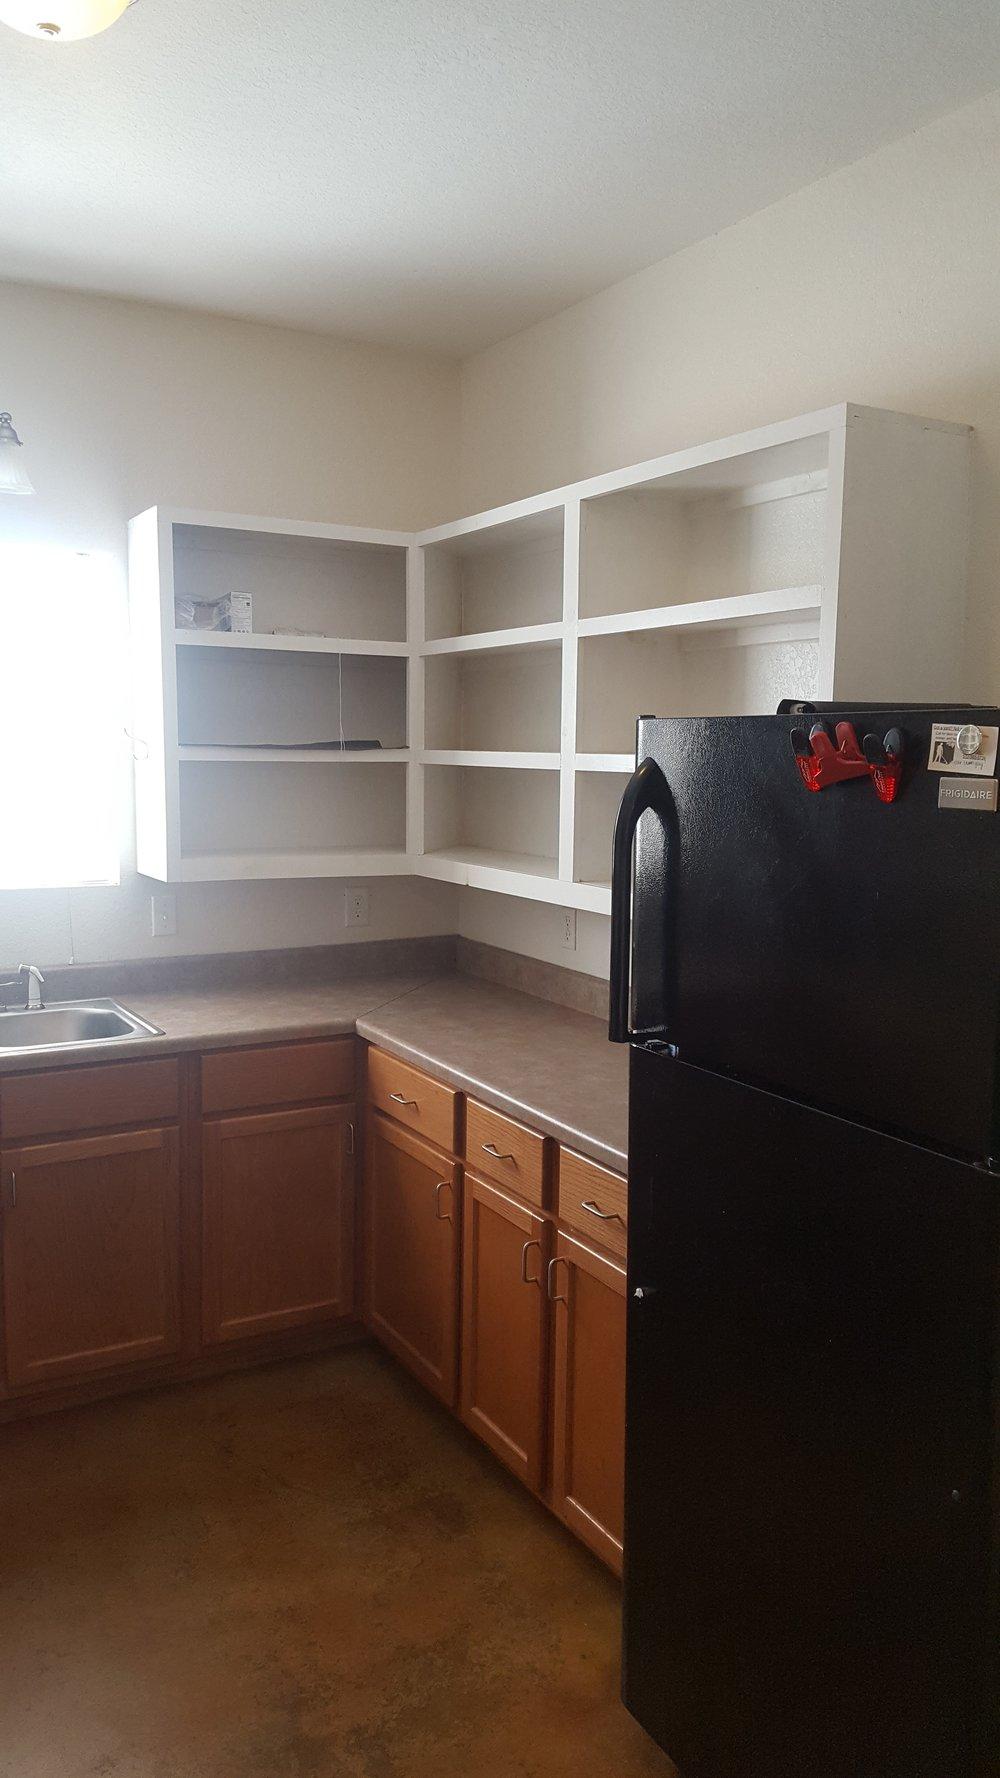 jones 1112 kitchen 2.jpg